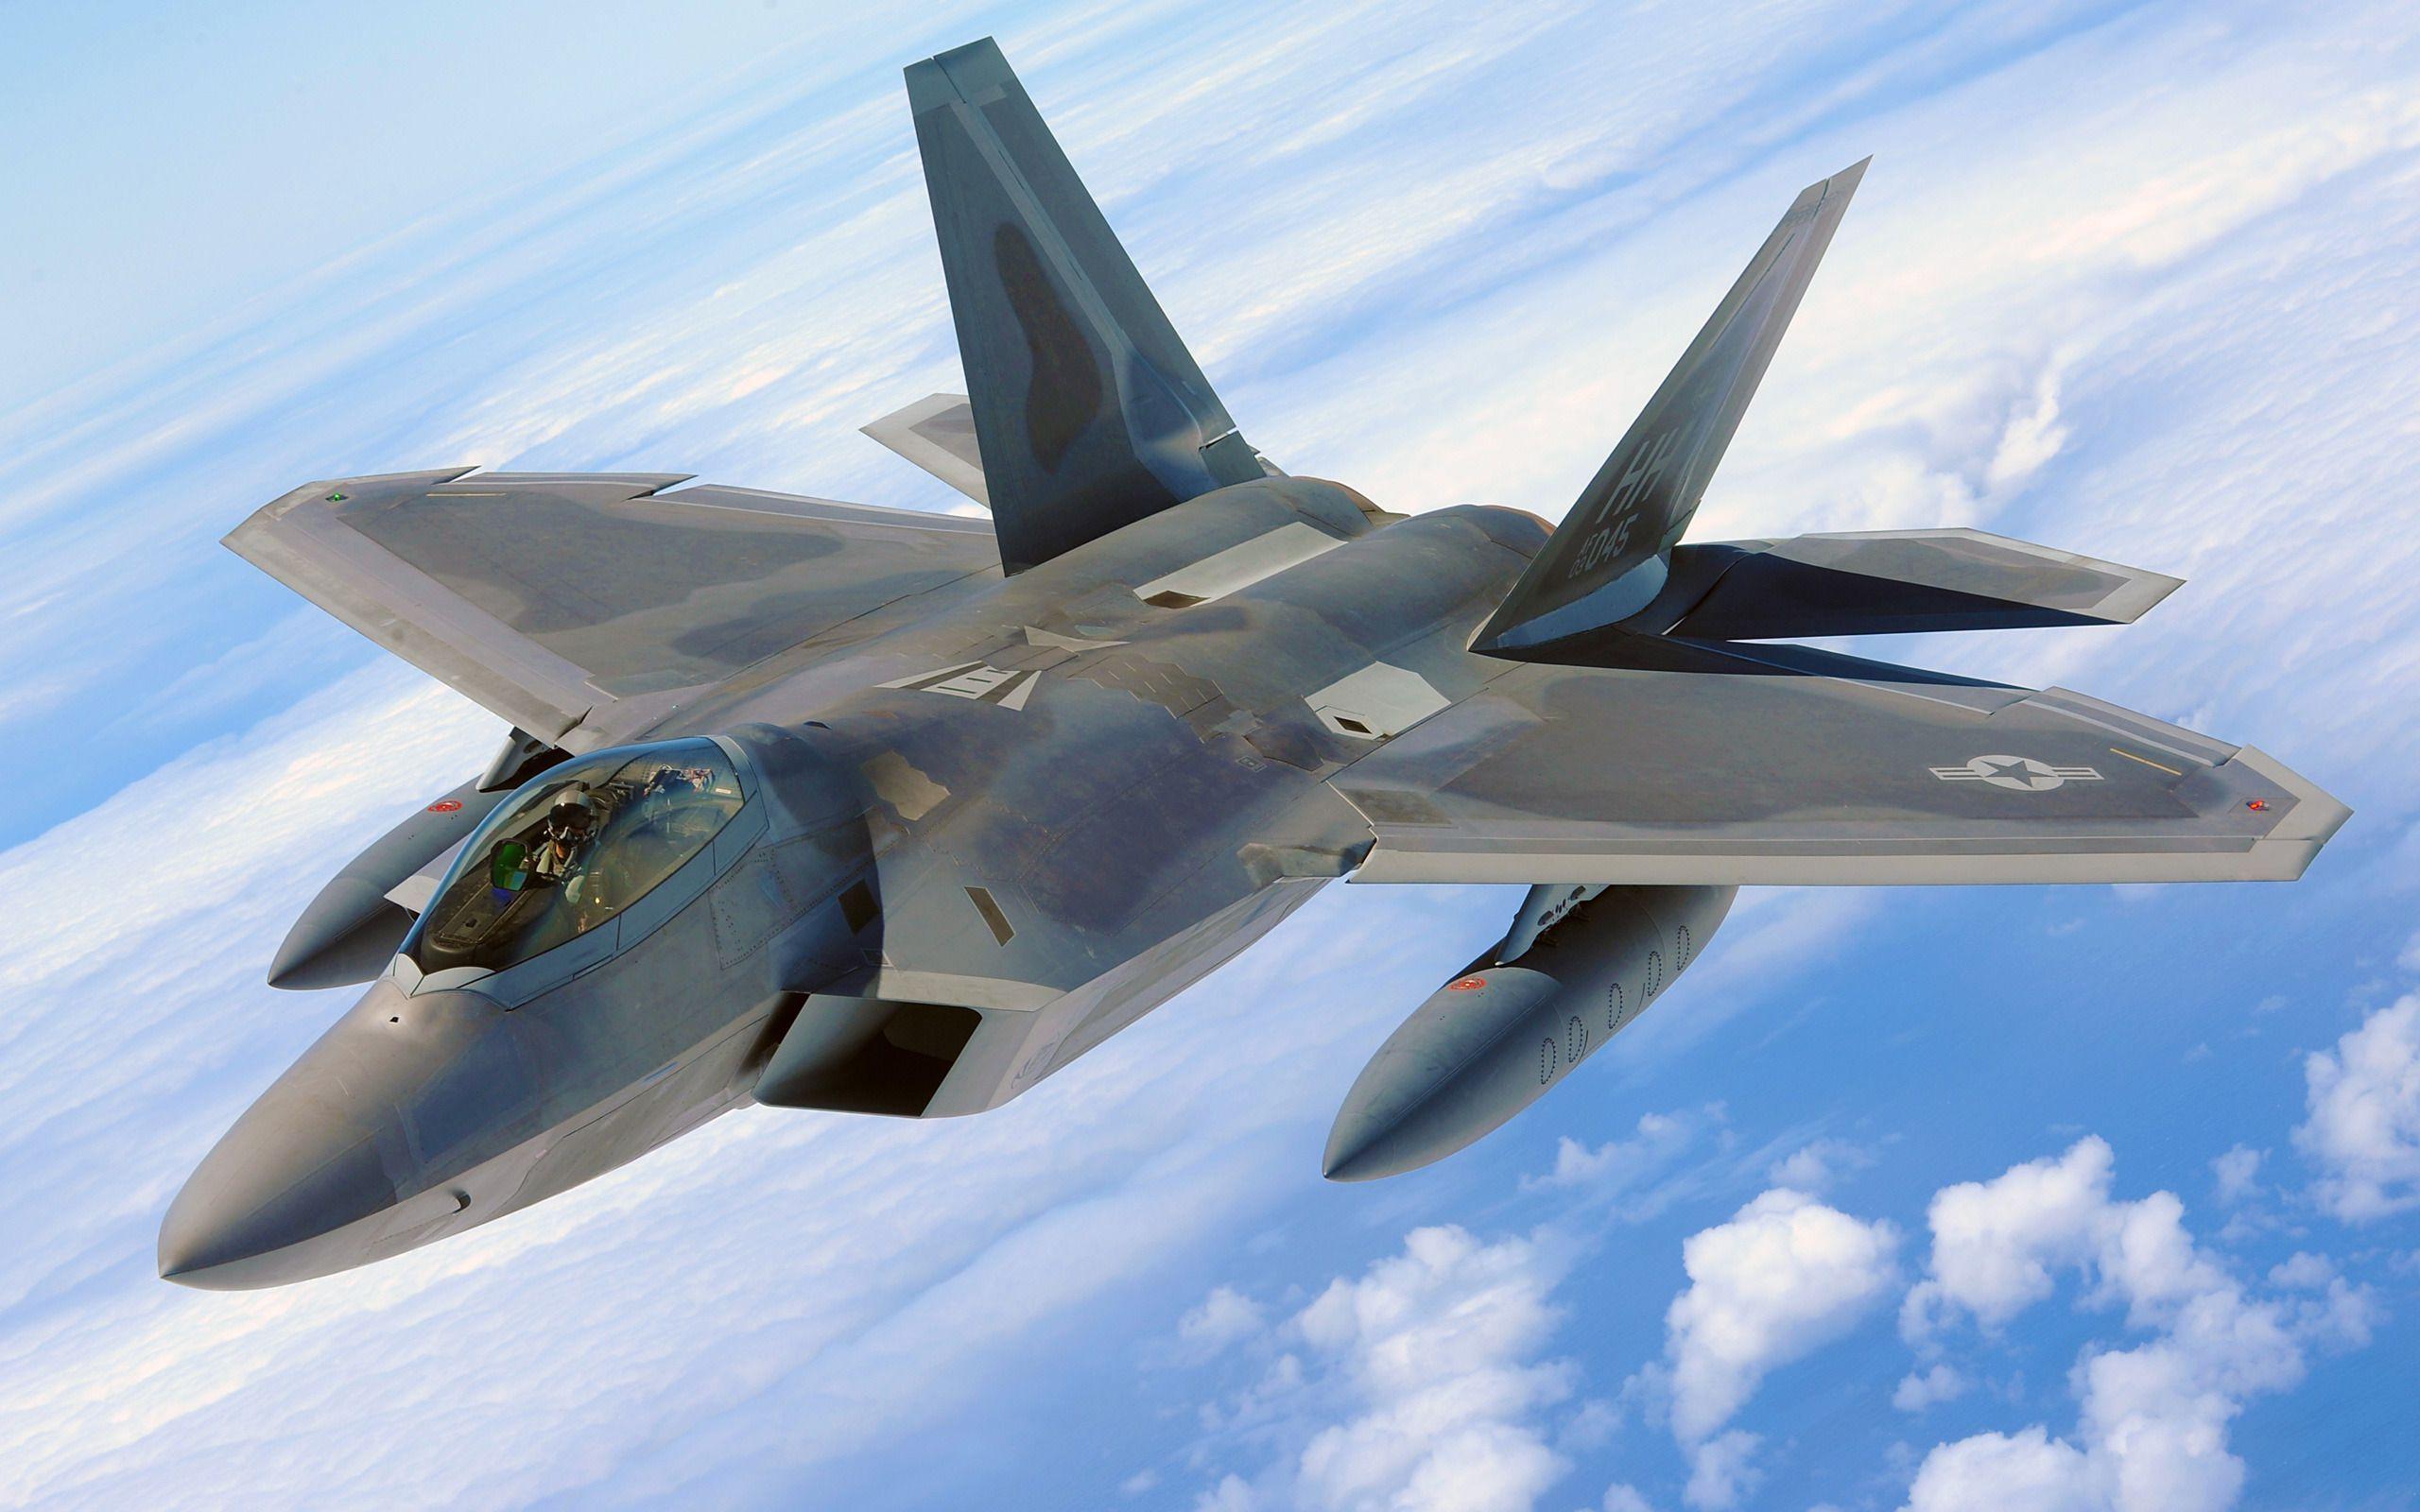 The Art of War Profiteering, Just Ask Lockheed Martin